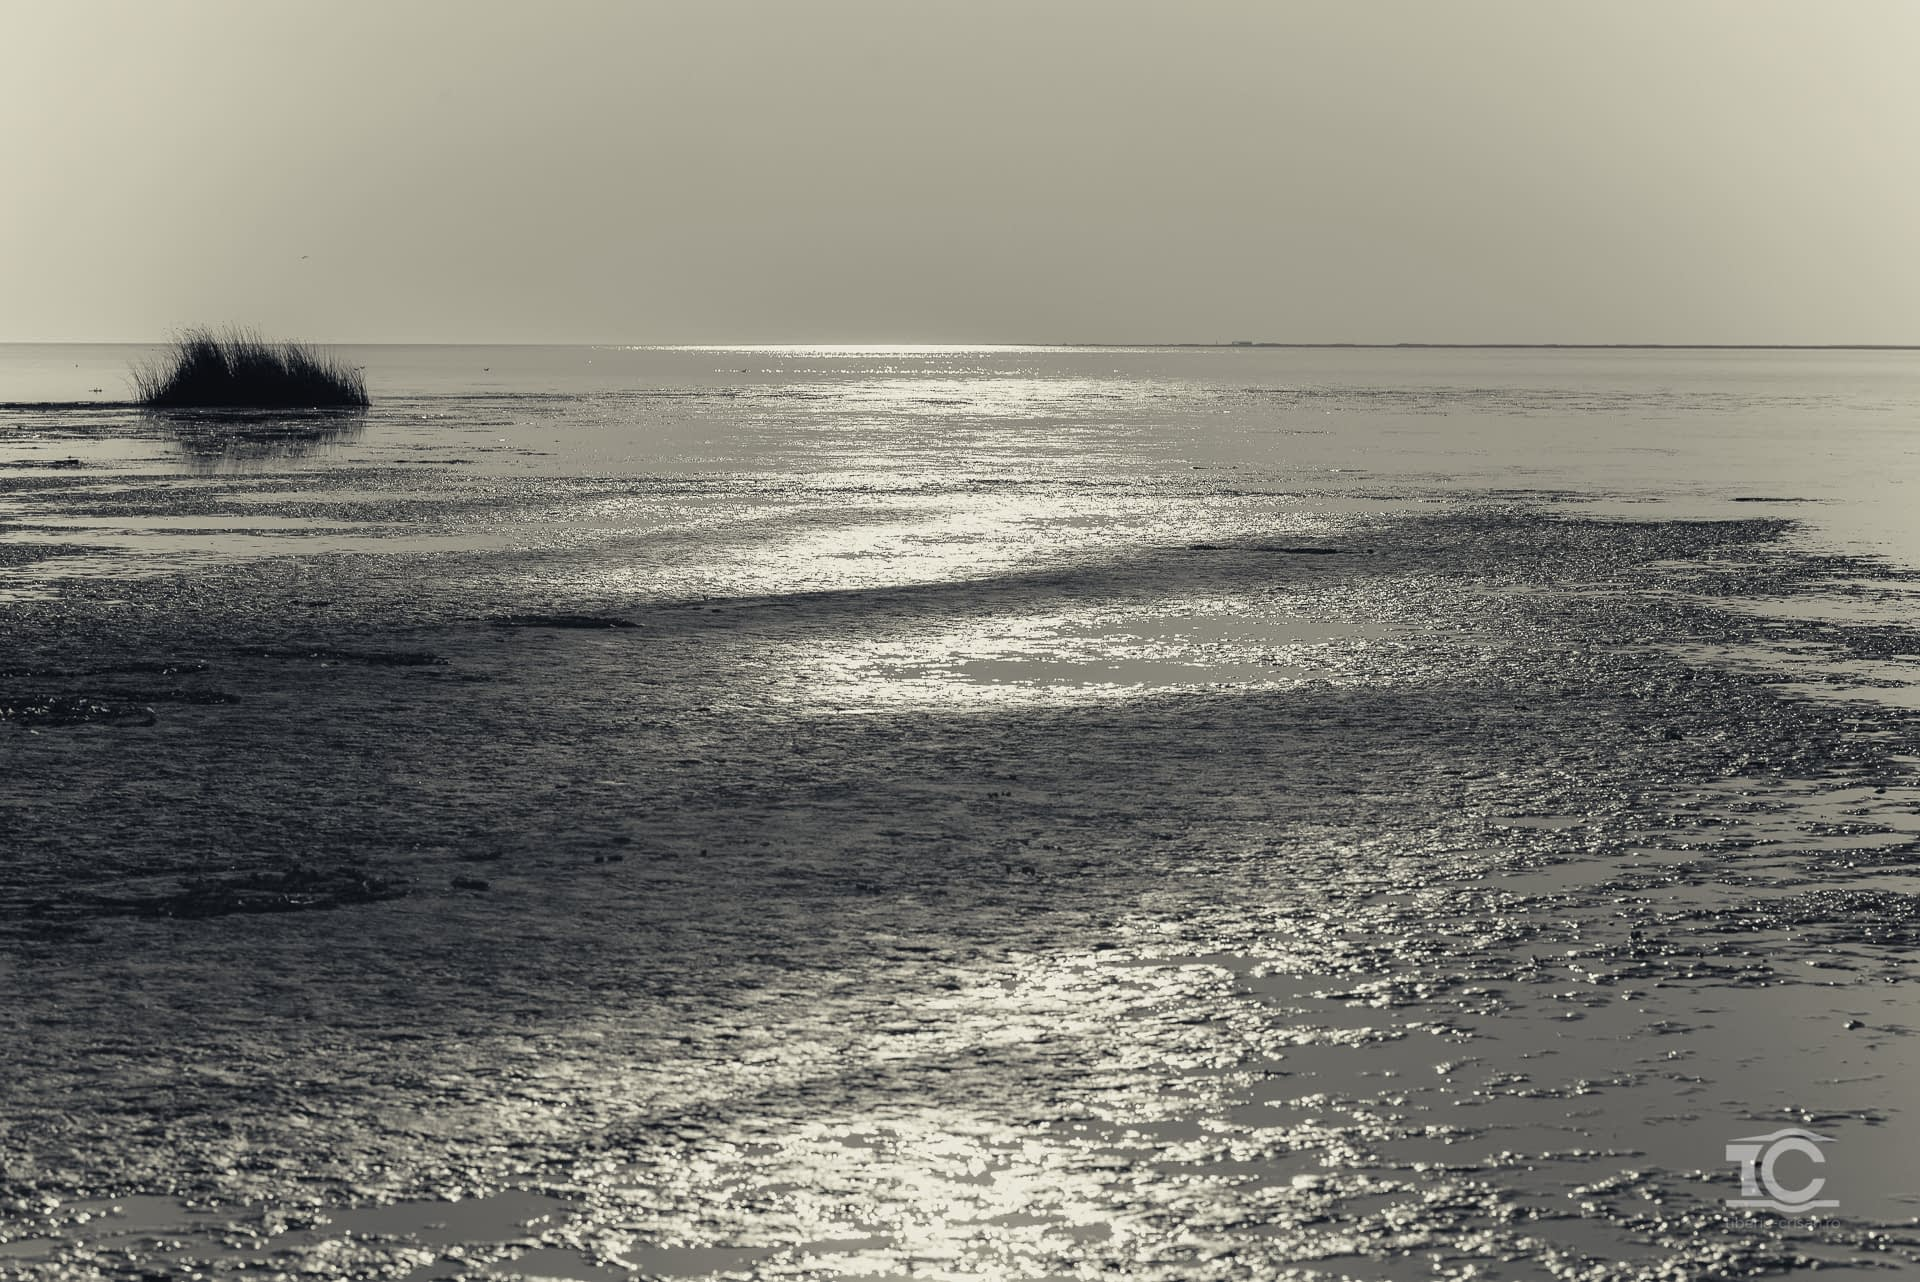 Apele insulei Sachalin